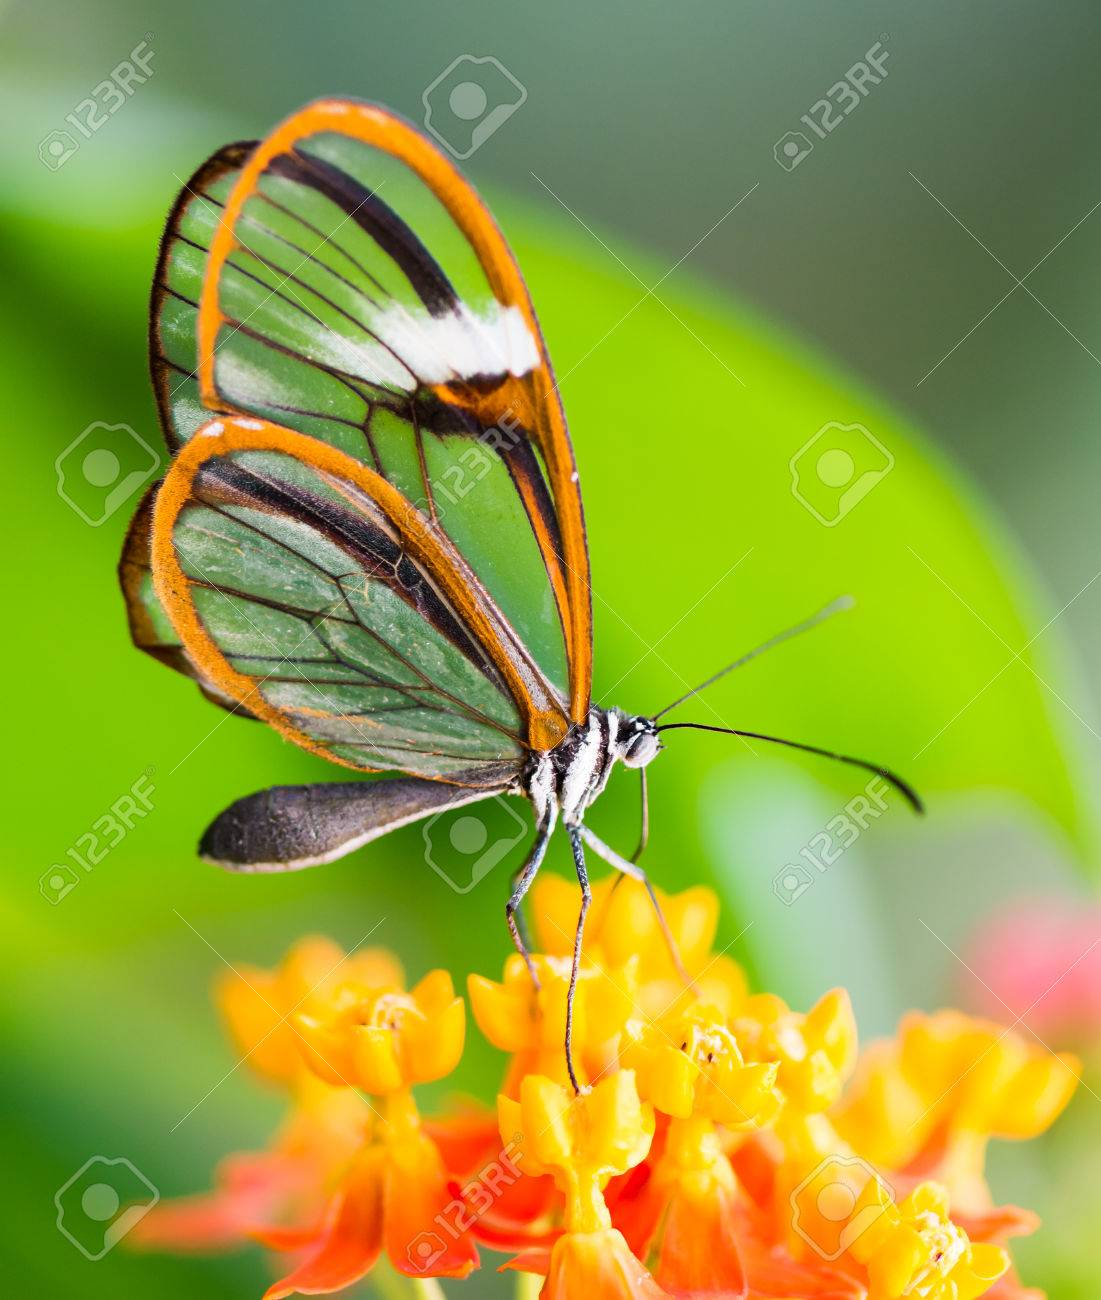 Maco Of A Glasswinged Butterfly Greta Oto On A Flower Stock Photo